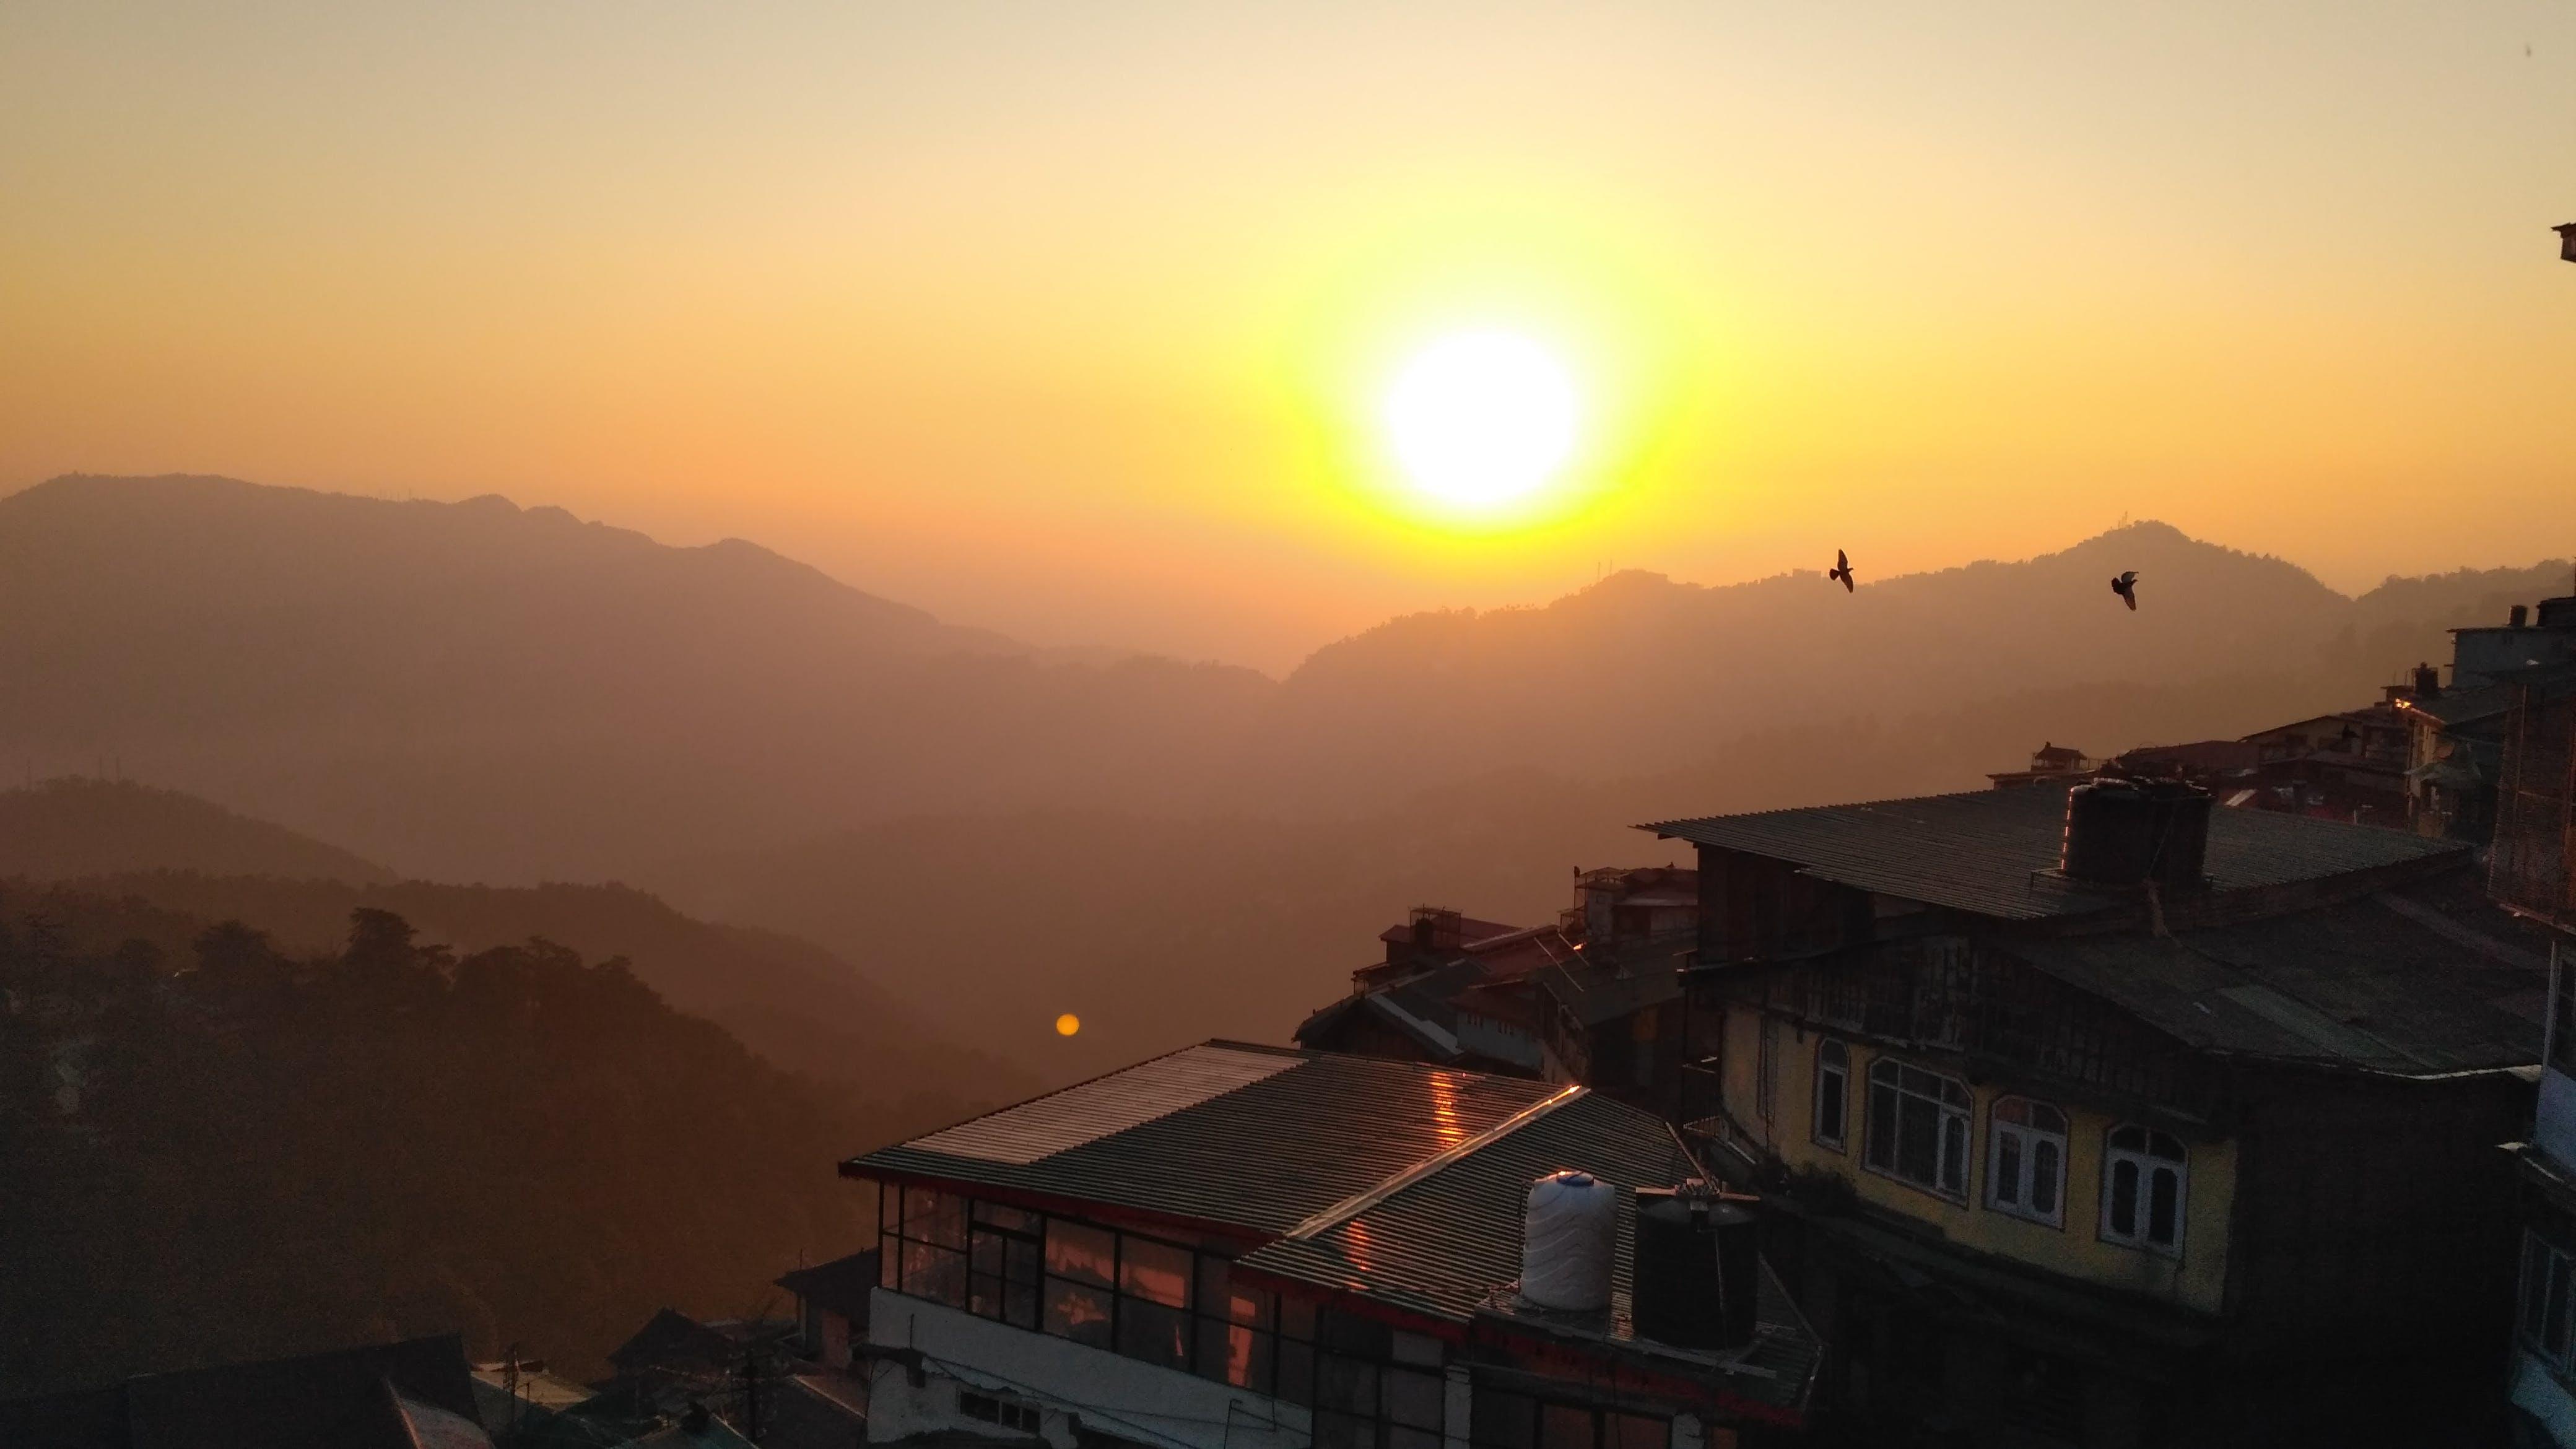 Gratis lagerfoto af bjerg, solnedgang